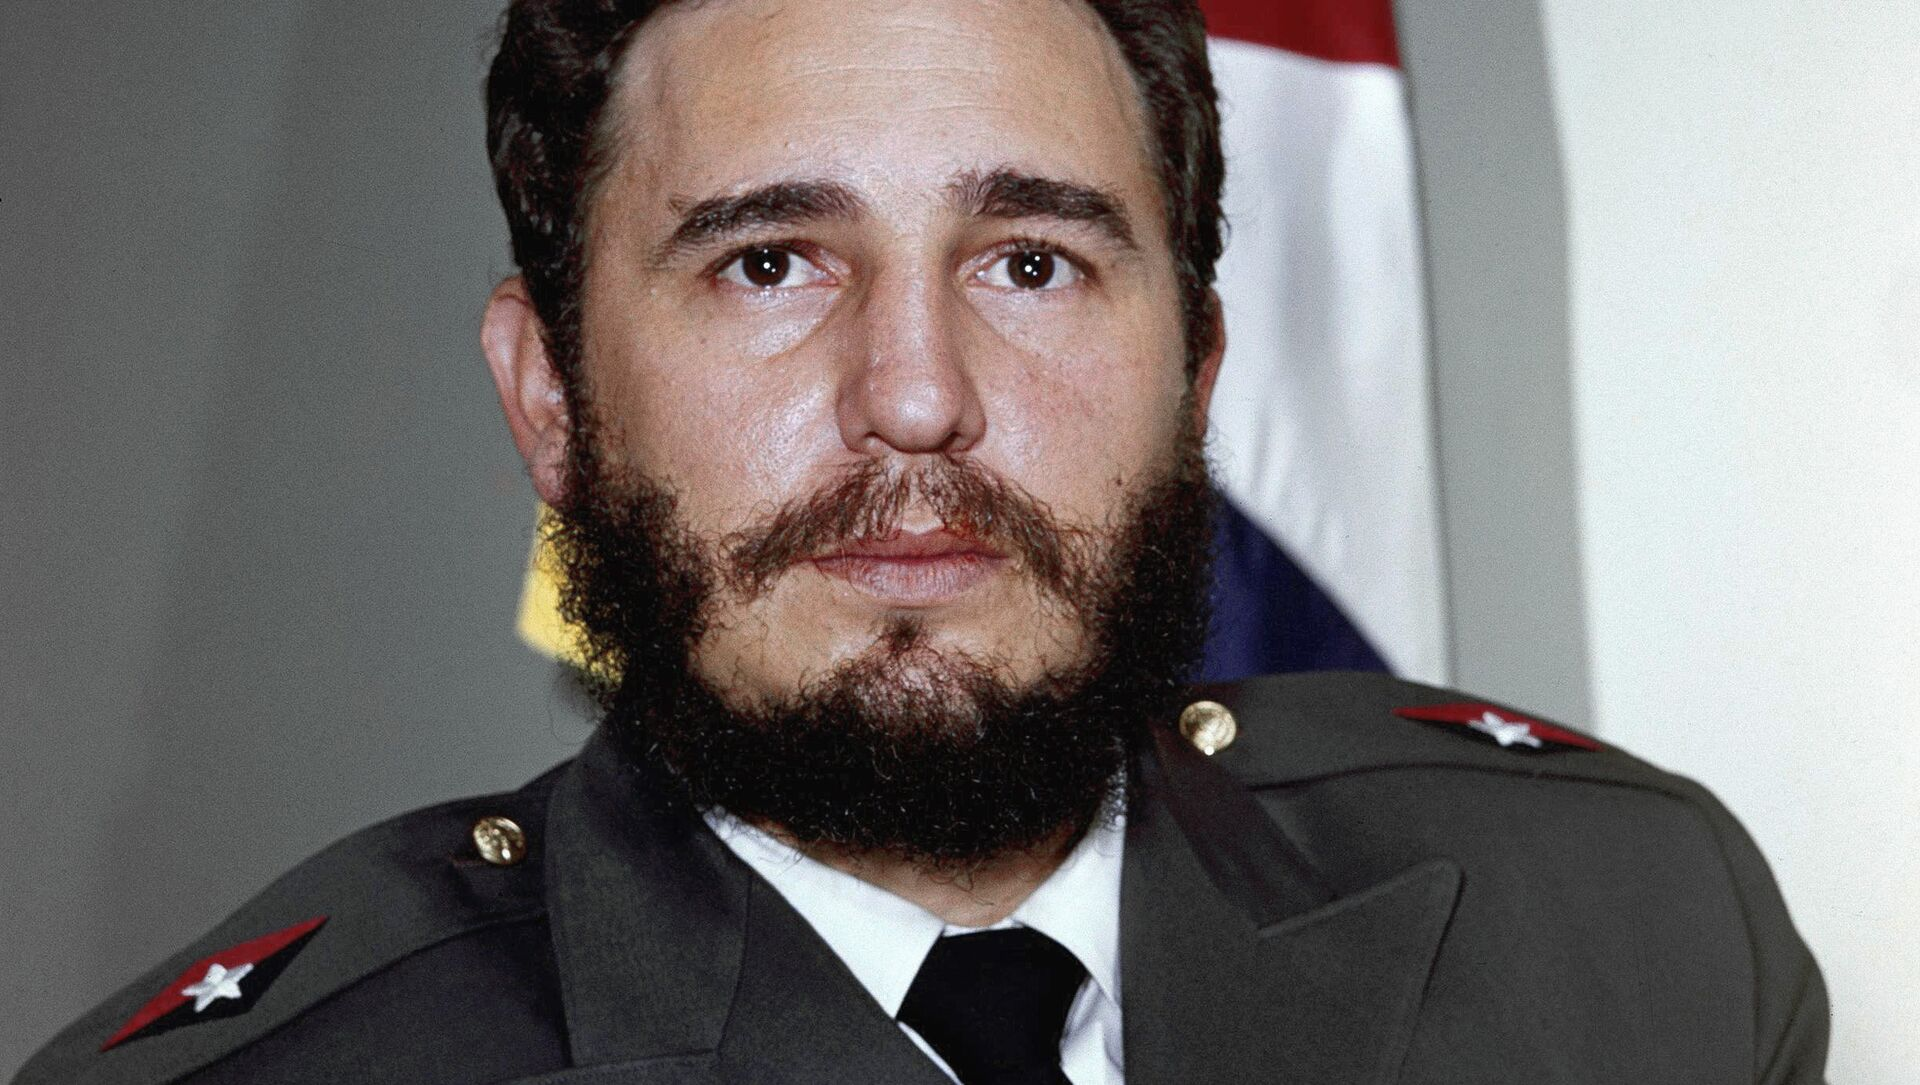 Fidel Castro, lider cubano (archivo) - Sputnik Mundo, 1920, 16.10.2018